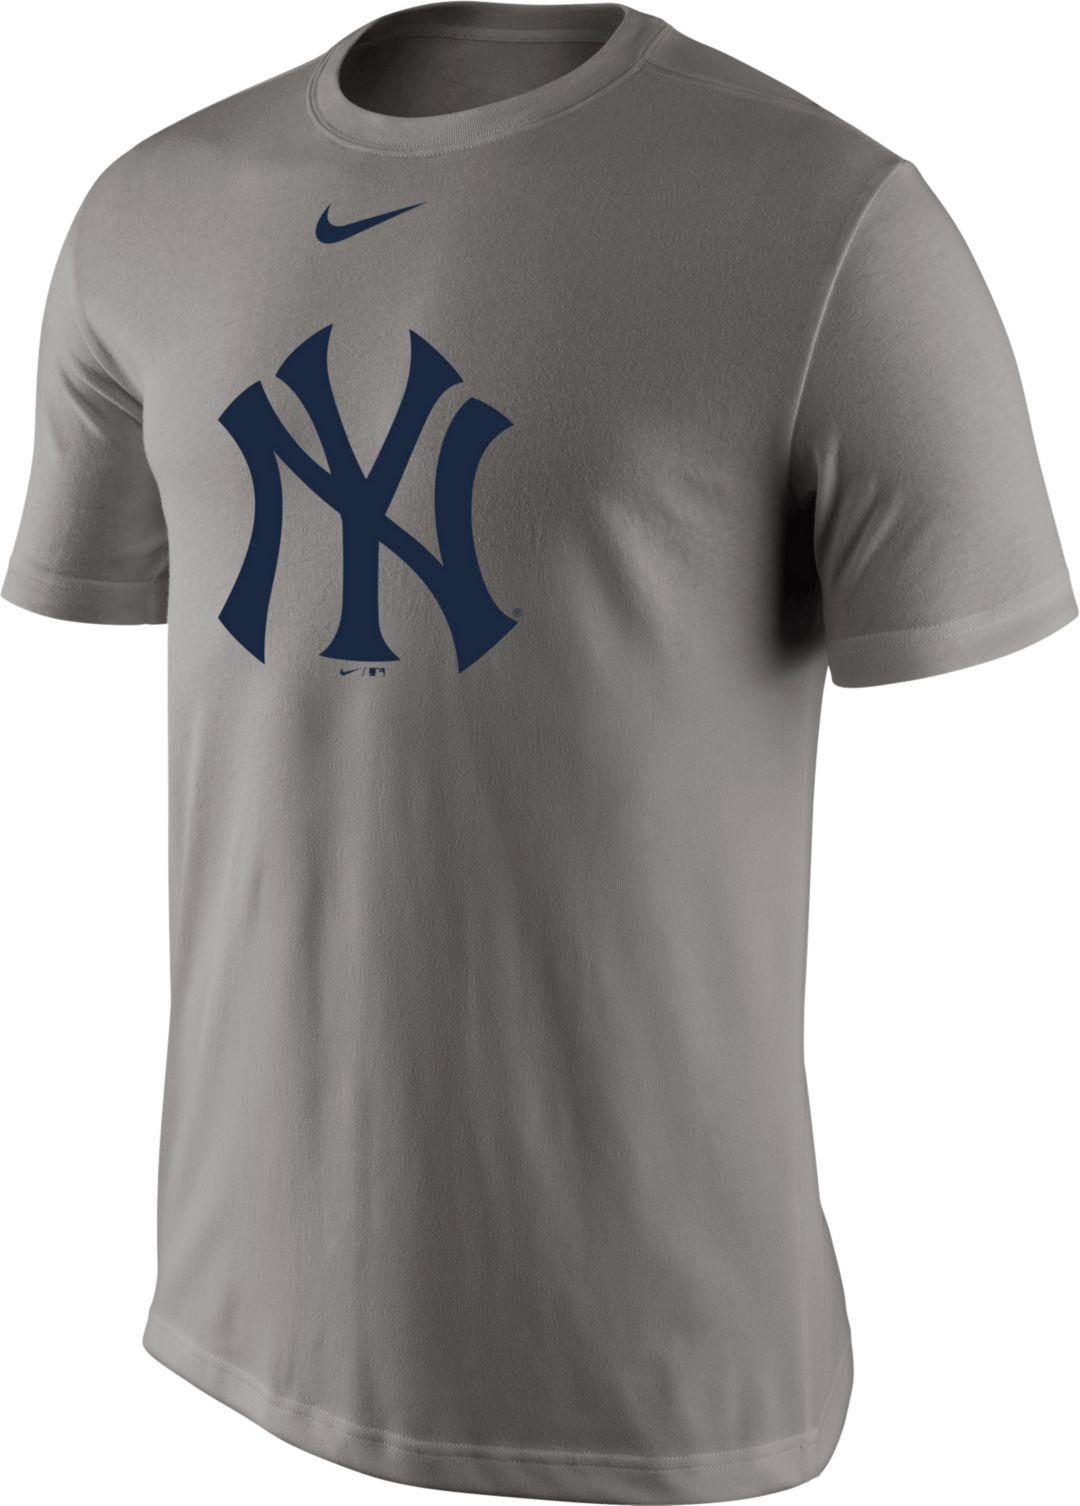 timeless design 0891b 2d399 Nike Men s New York Yankees Dri-FIT Grey Legend T-Shirt. noImageFound. 1